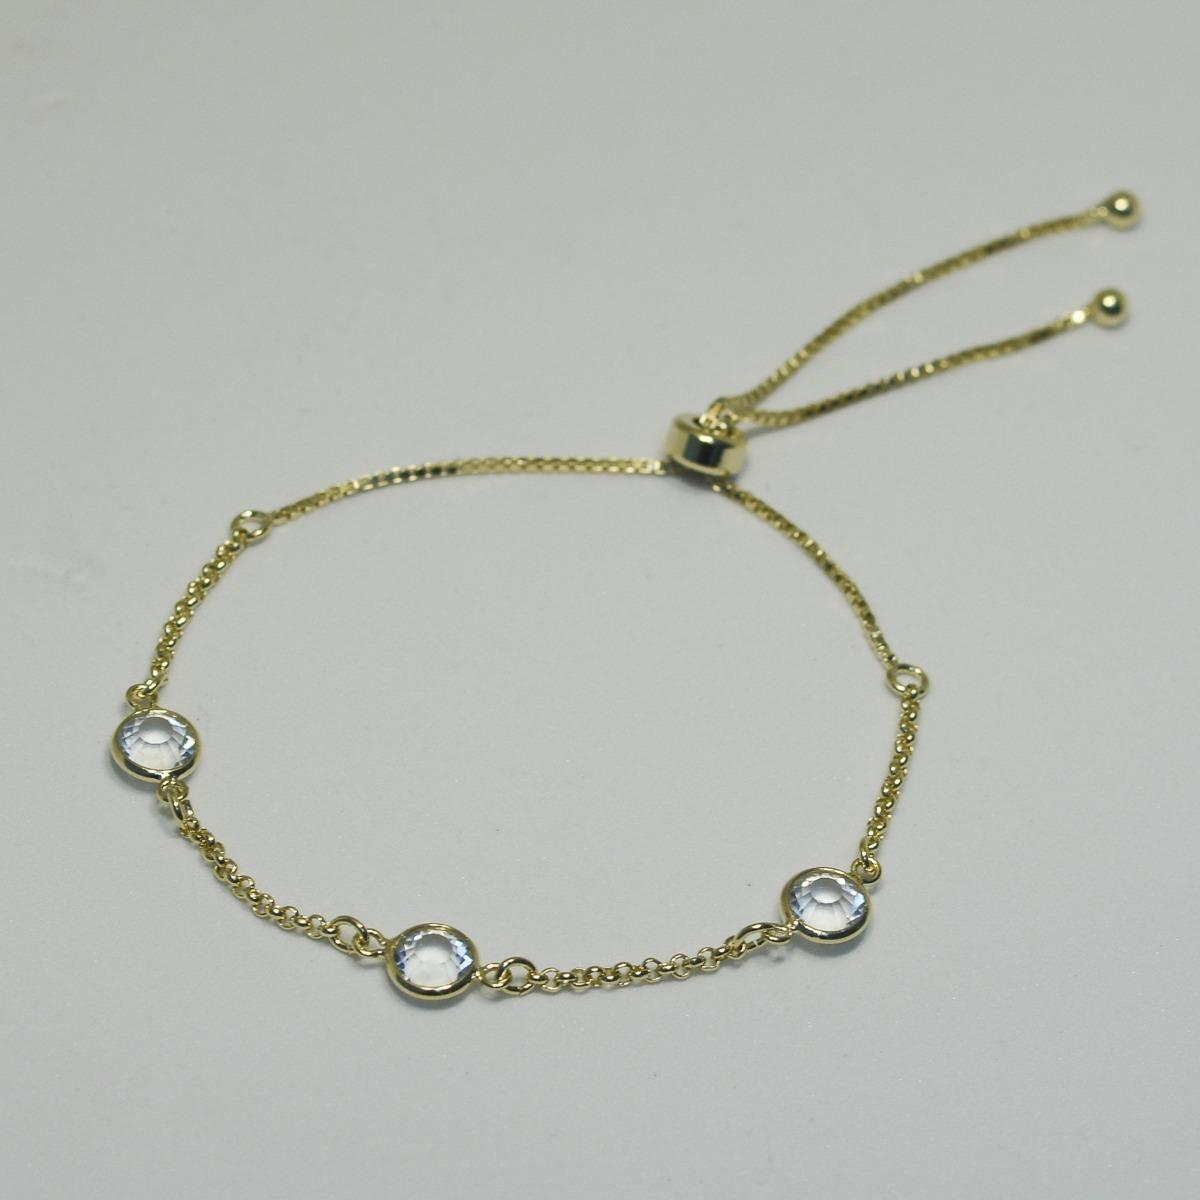 bc99434ae92 Pulseira Shambala Com Cristal Banho Ródio Branco Ouro 18k - R  52